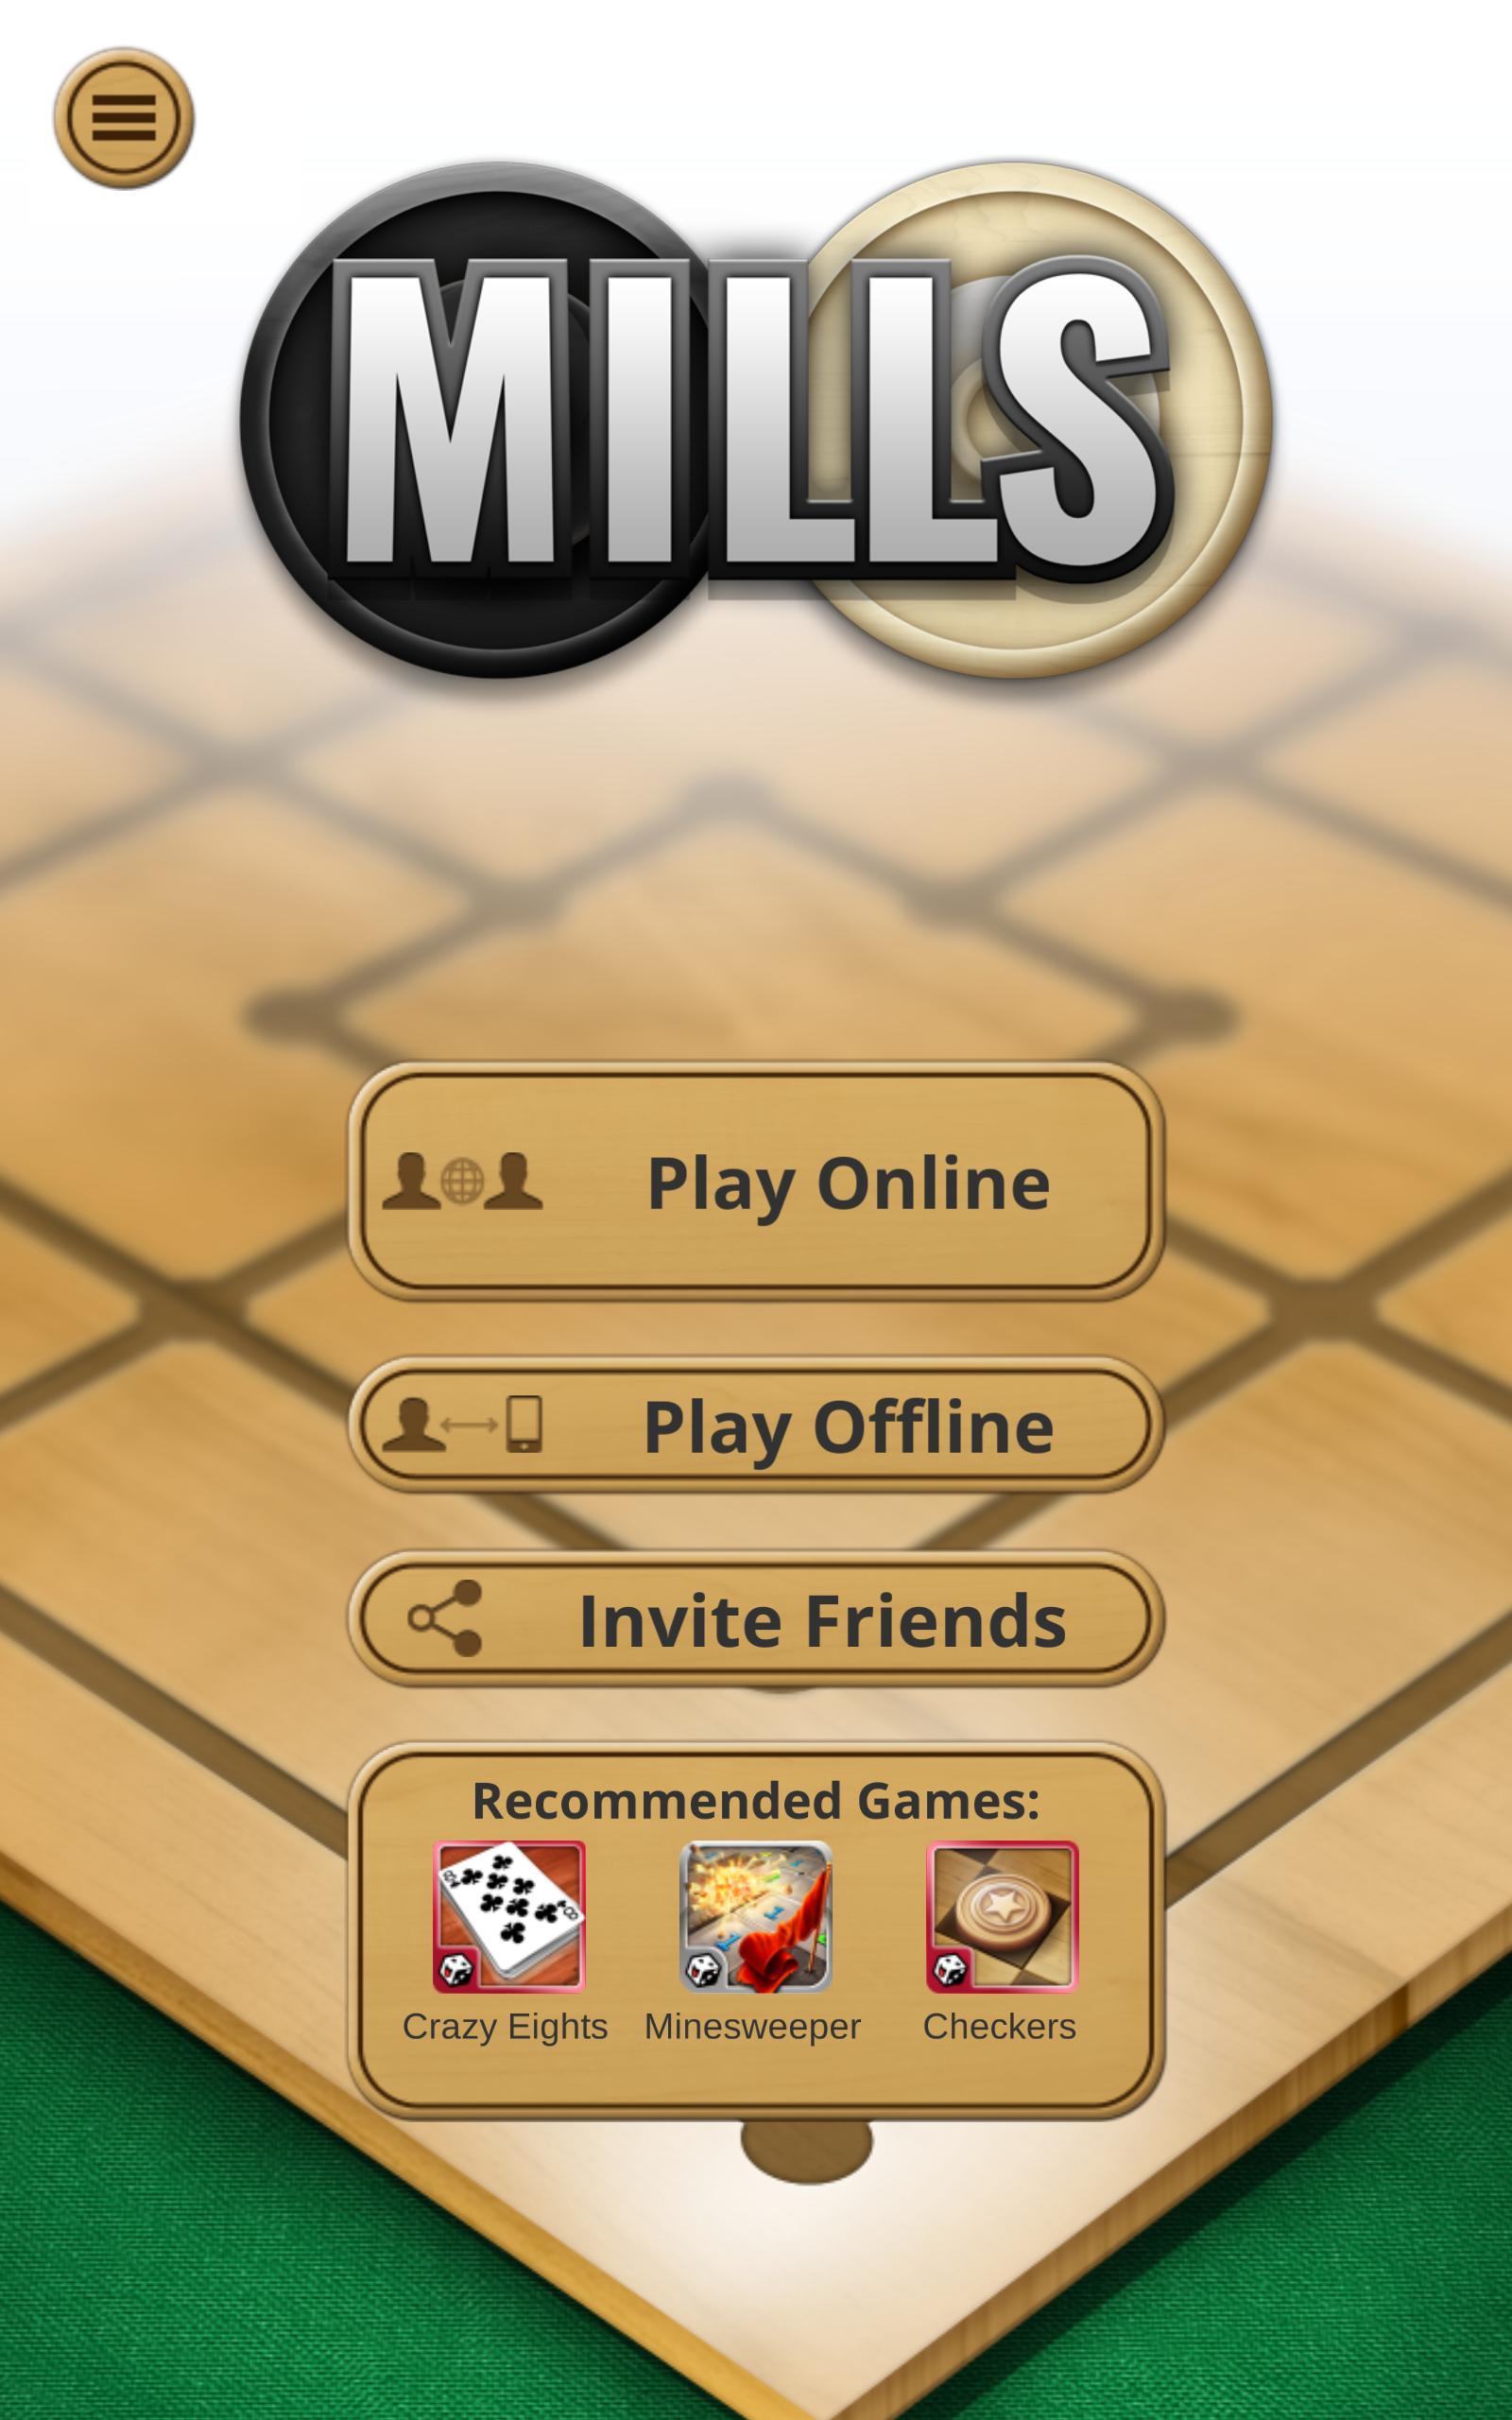 Nine men's Morris - Mills - Free online board game 2.8.11 Screenshot 16